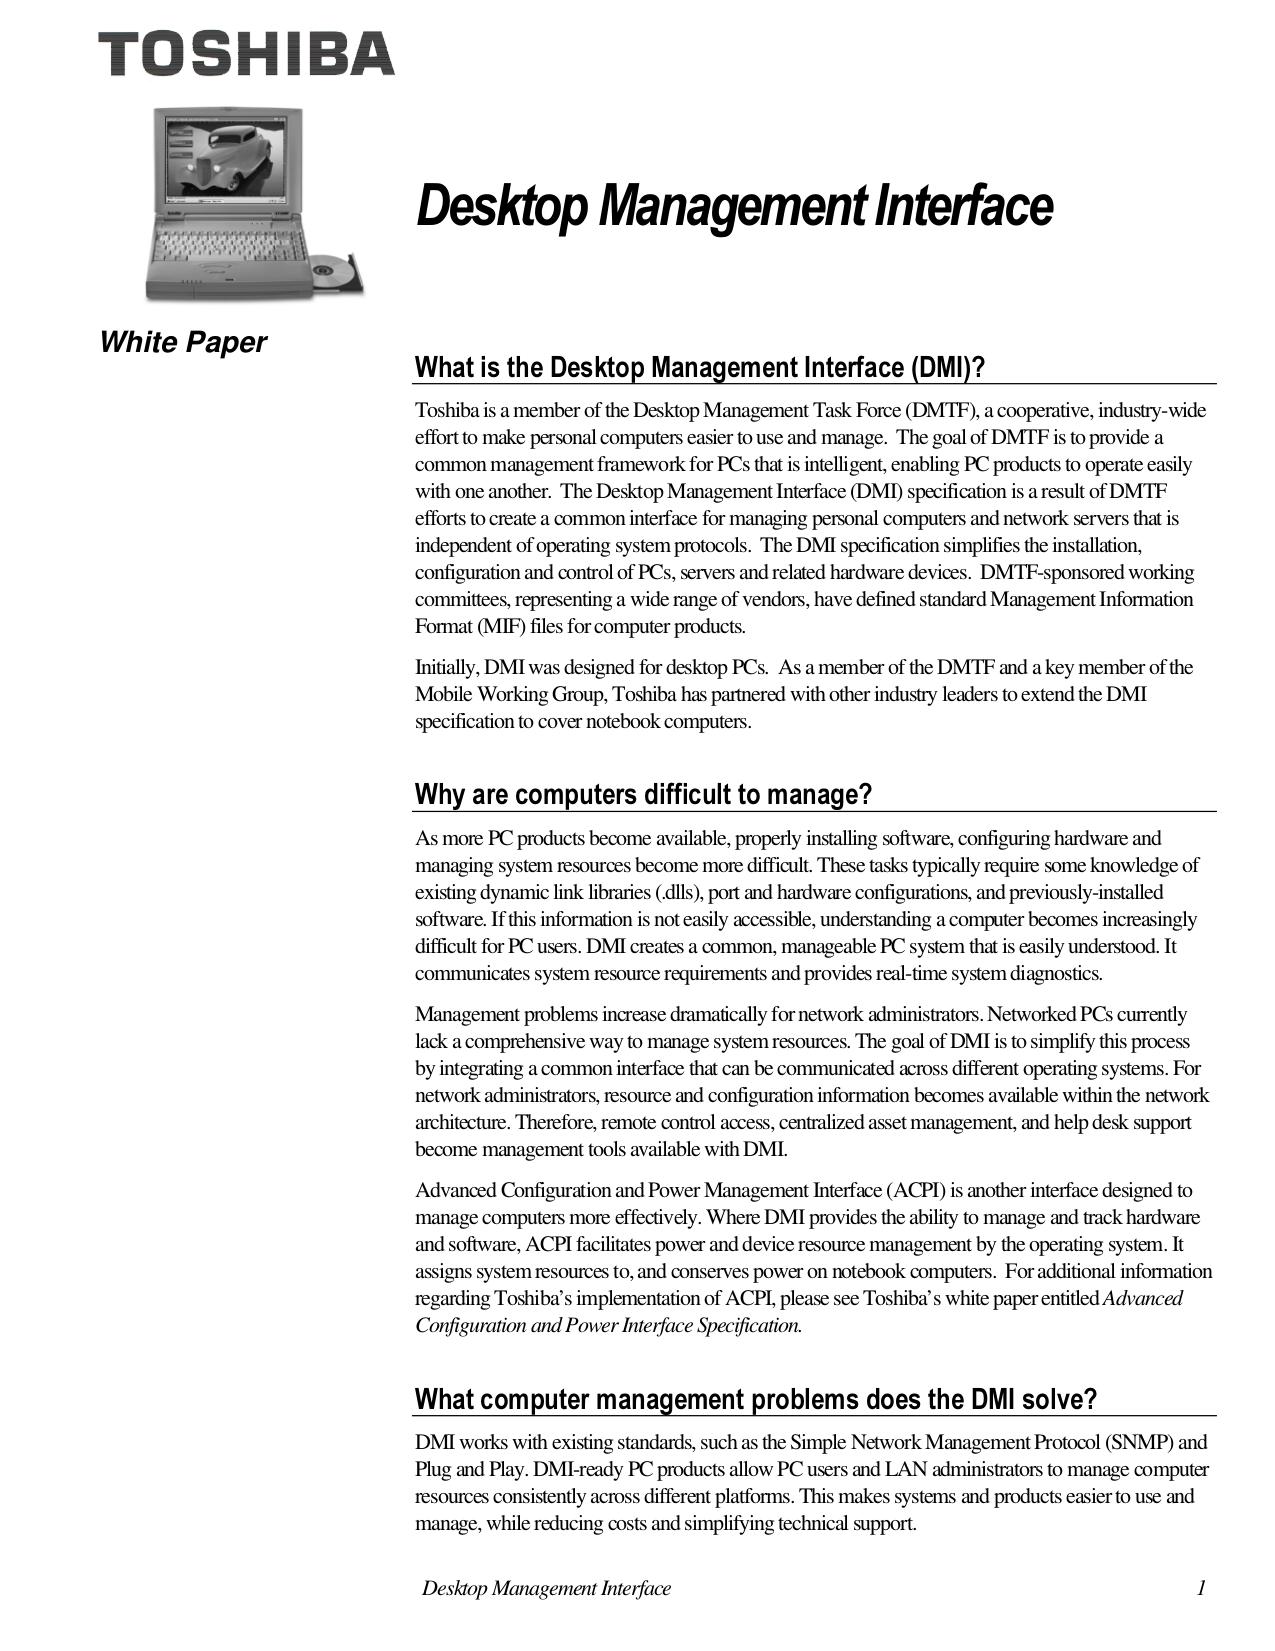 PDF manual for Toshiba Laptop Satellite 4010CDS